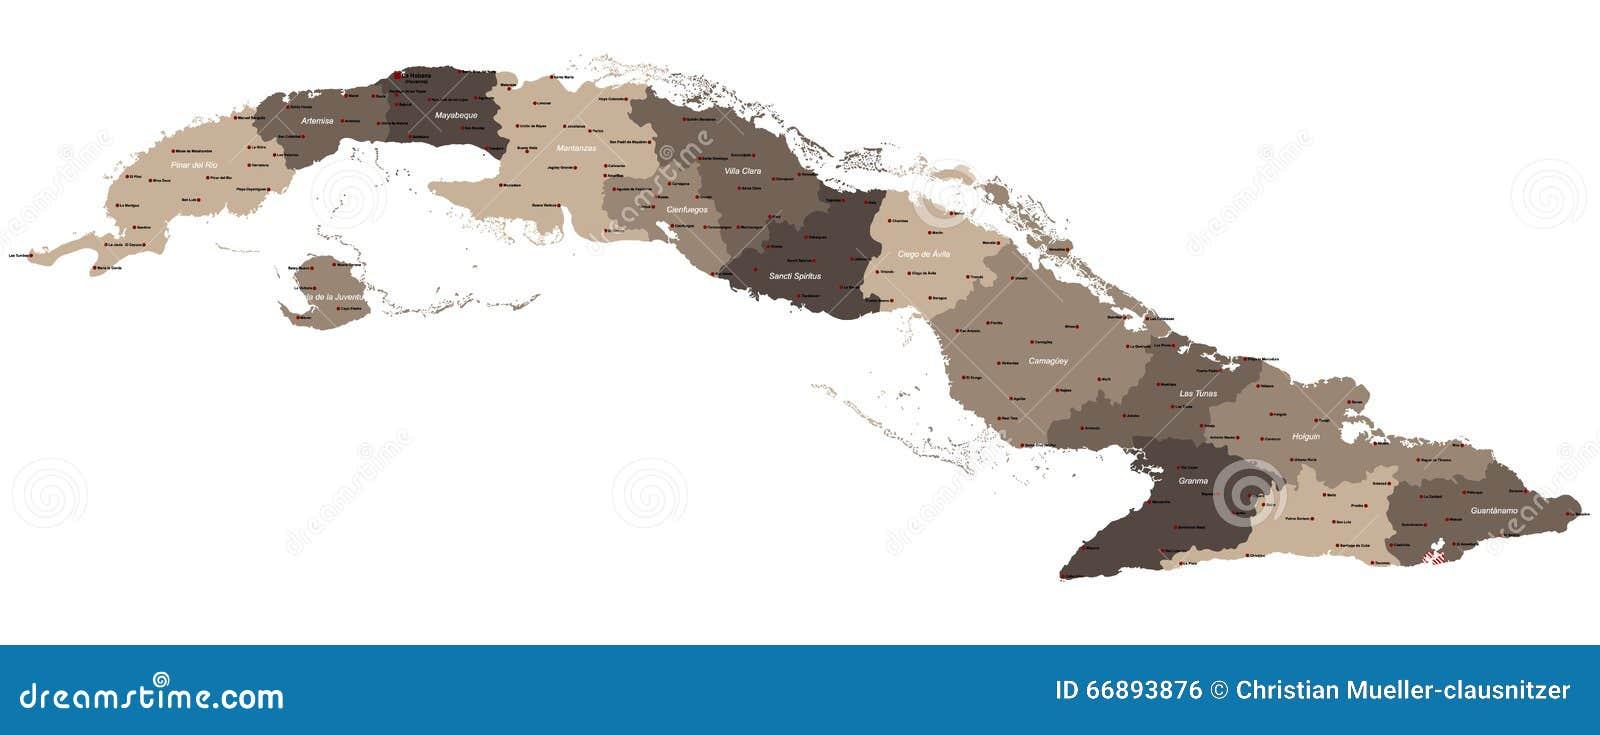 Map Of Cuba Stock Vector Image Of County Area America - Cuba provinces map